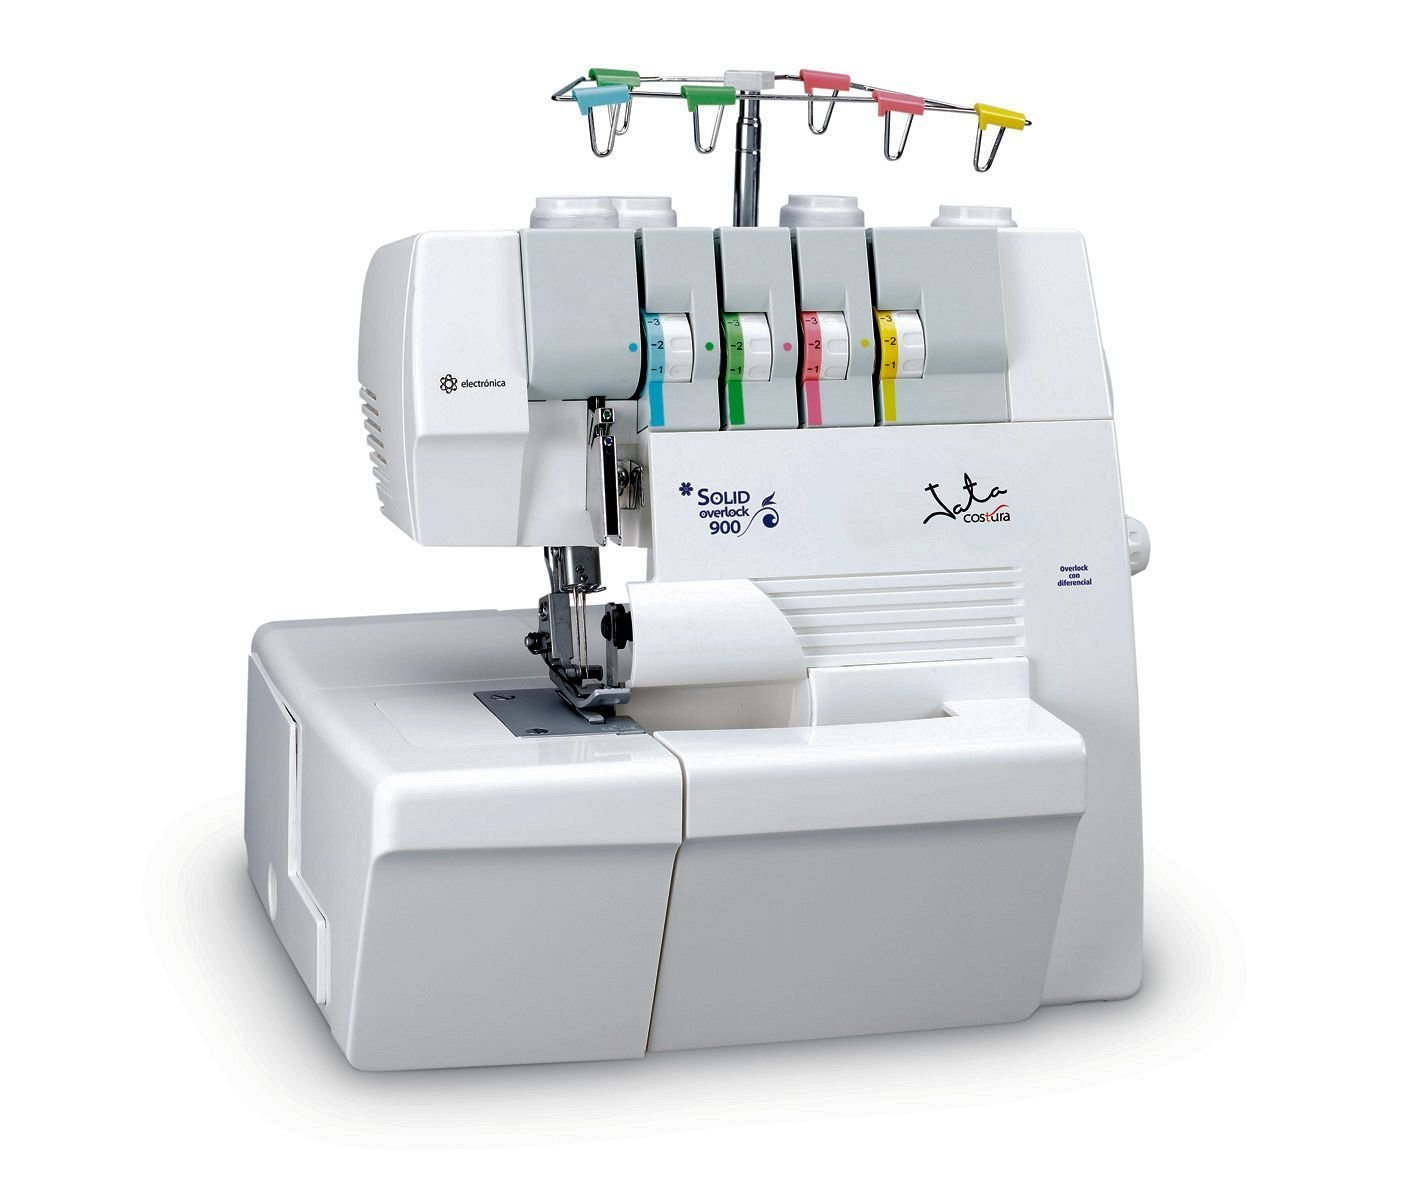 Máy may    Jata 29 X 26 x 30 cm Solid Overlock 900 Sewing Machine, White.